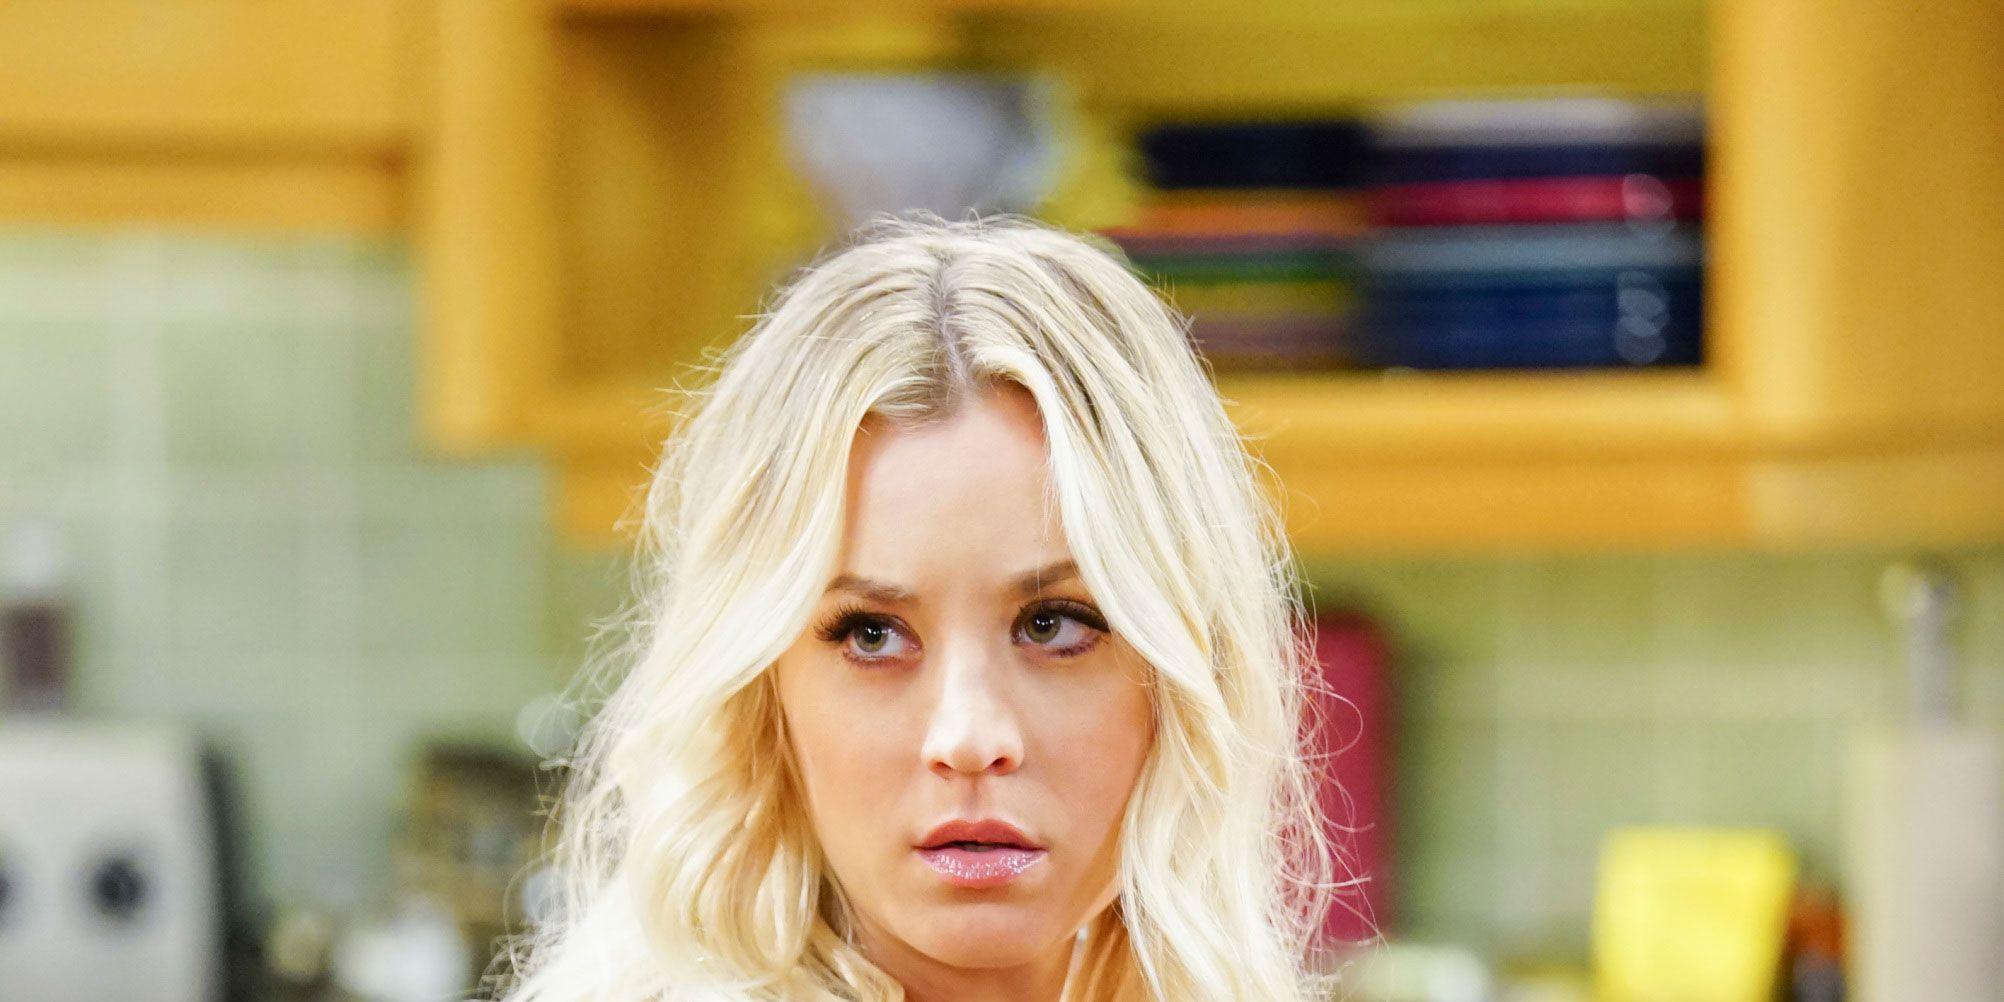 The Big Bang Theory, Penny played by Kaley Cuoco